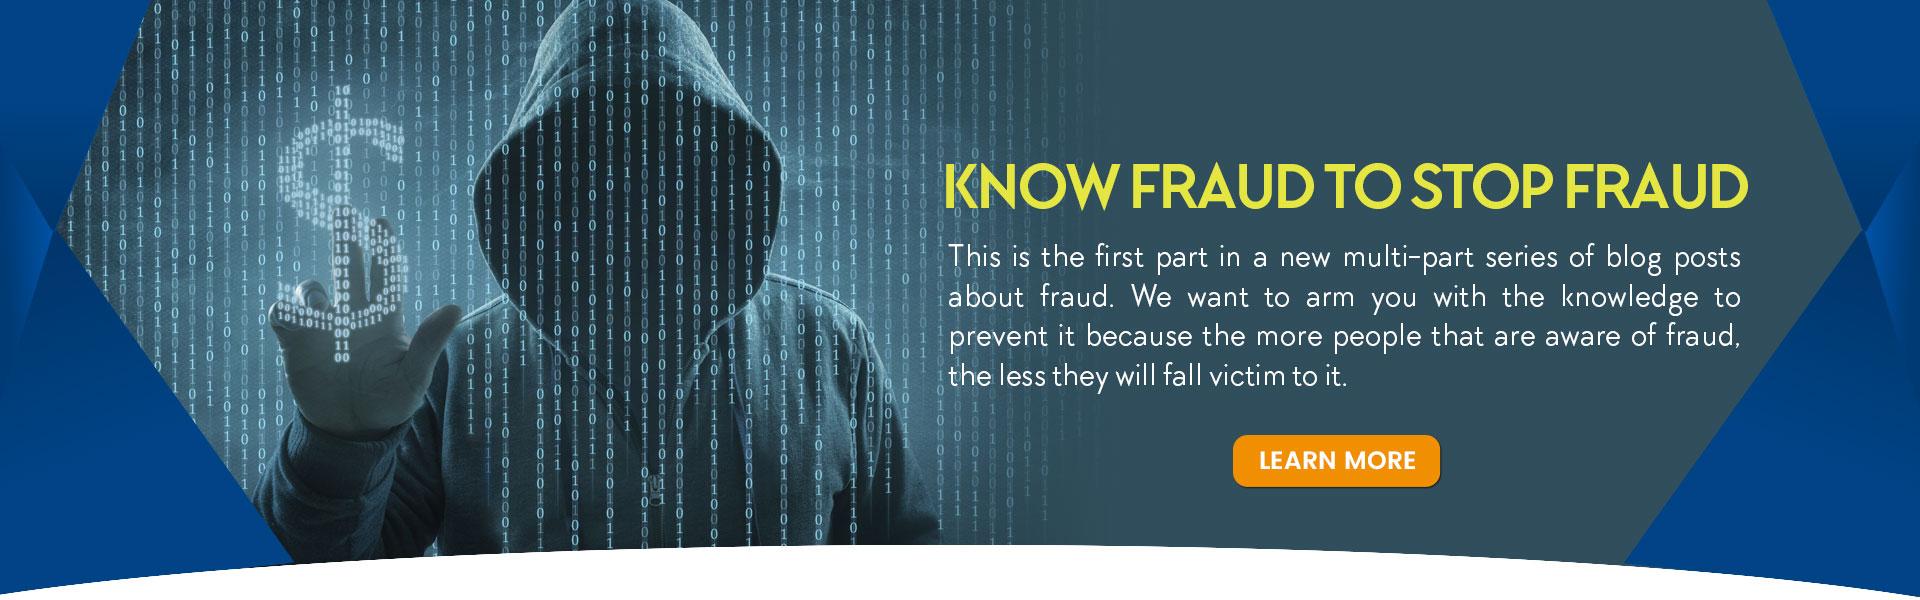 Know Fraud to Stop Fraud